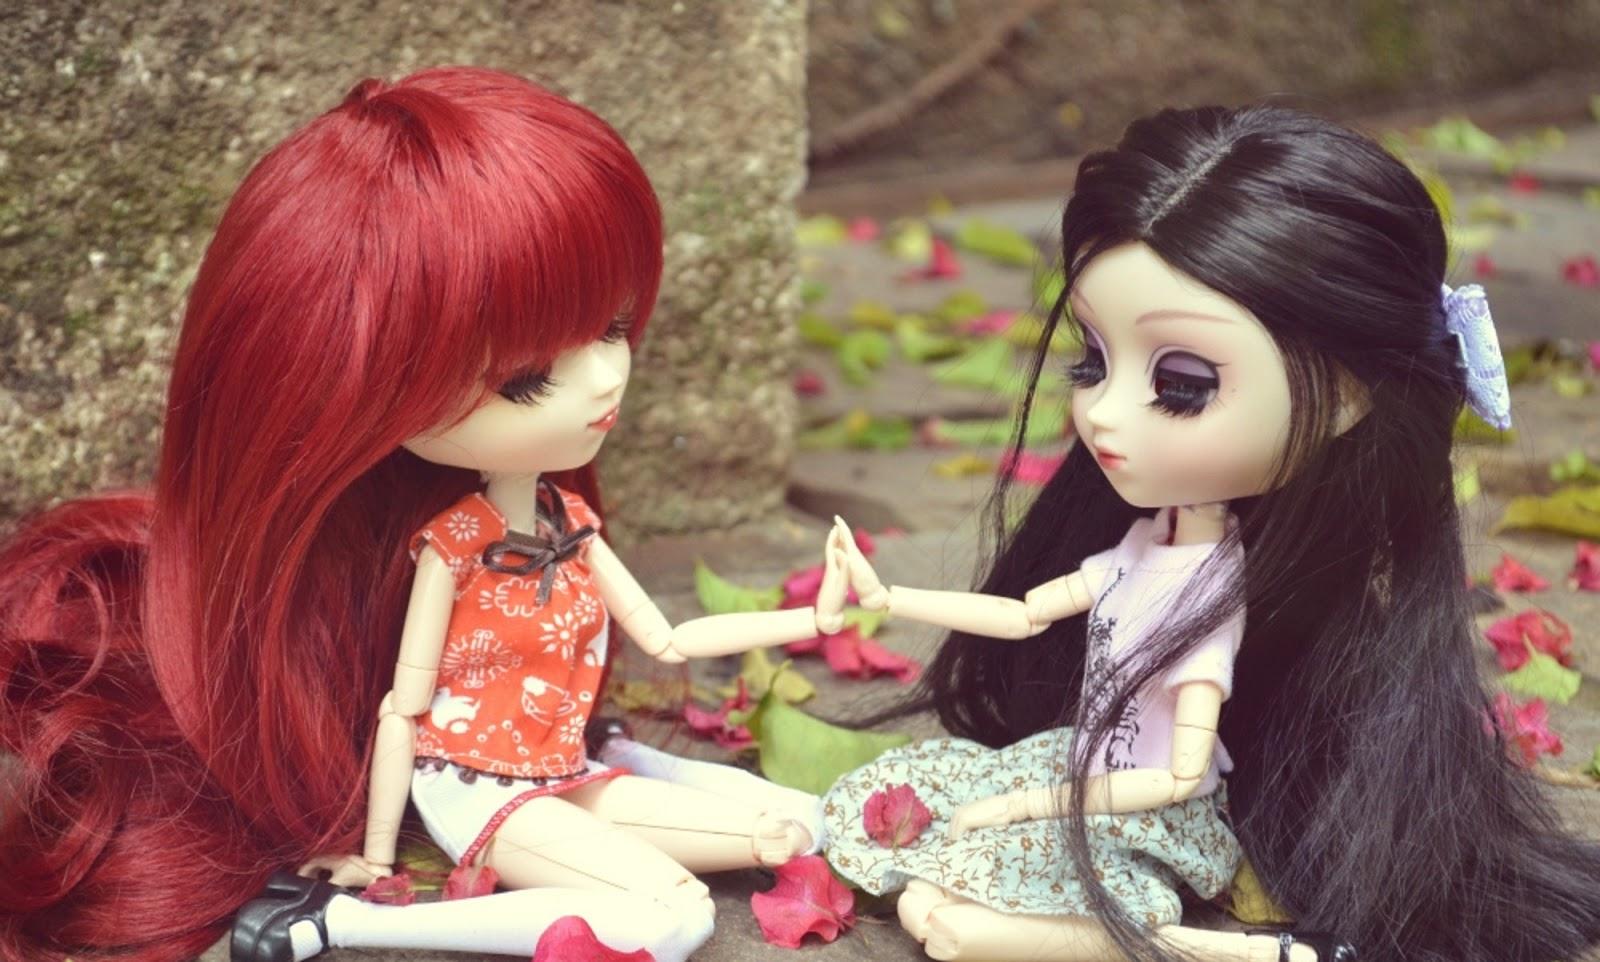 Barbie Dolls Hd Wallpaper Free Download: Cute Baby Barbie Doll Wallpaper